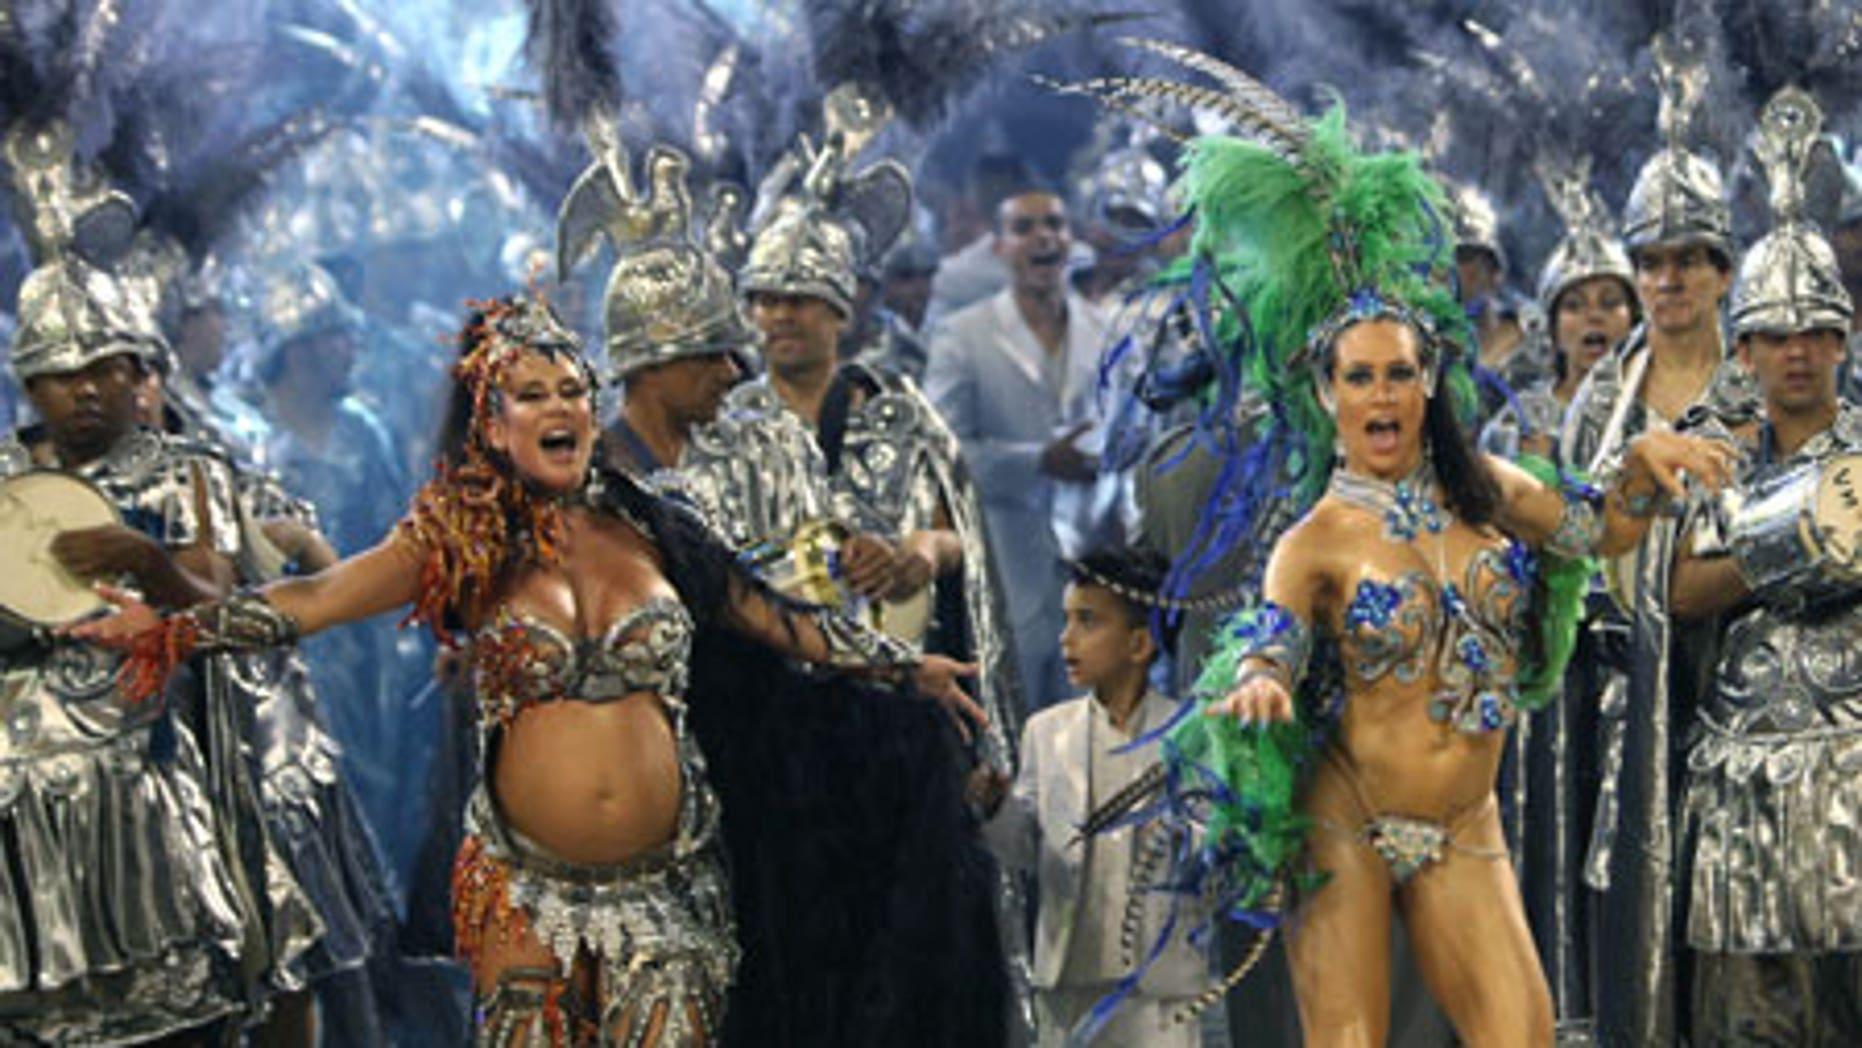 Feb. 13: Dancers perform during the parade of Unidos de Vila Maria samba school at the Sambadrome.